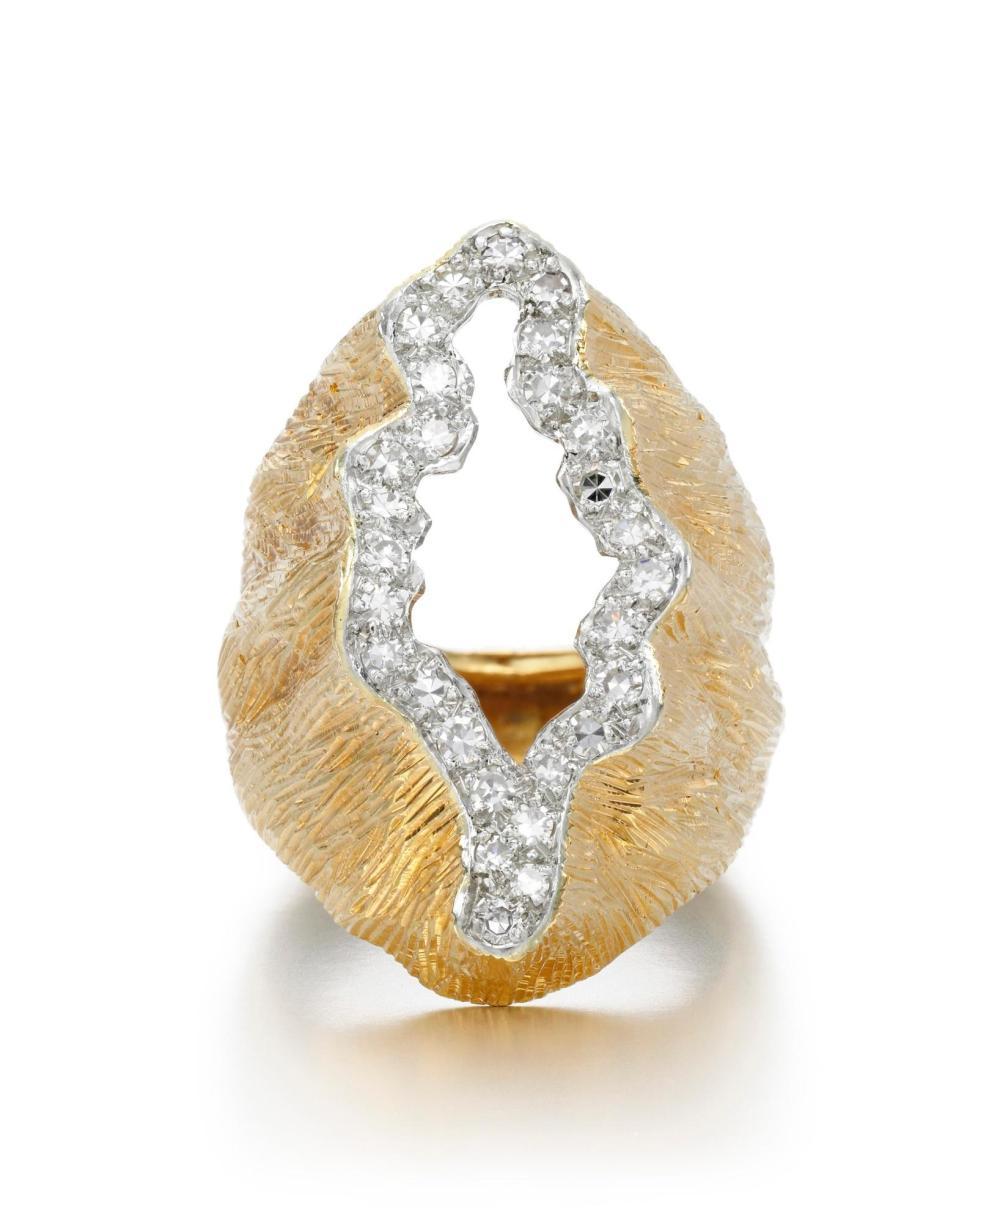 DIAMOND RING, GRIMA, 1968